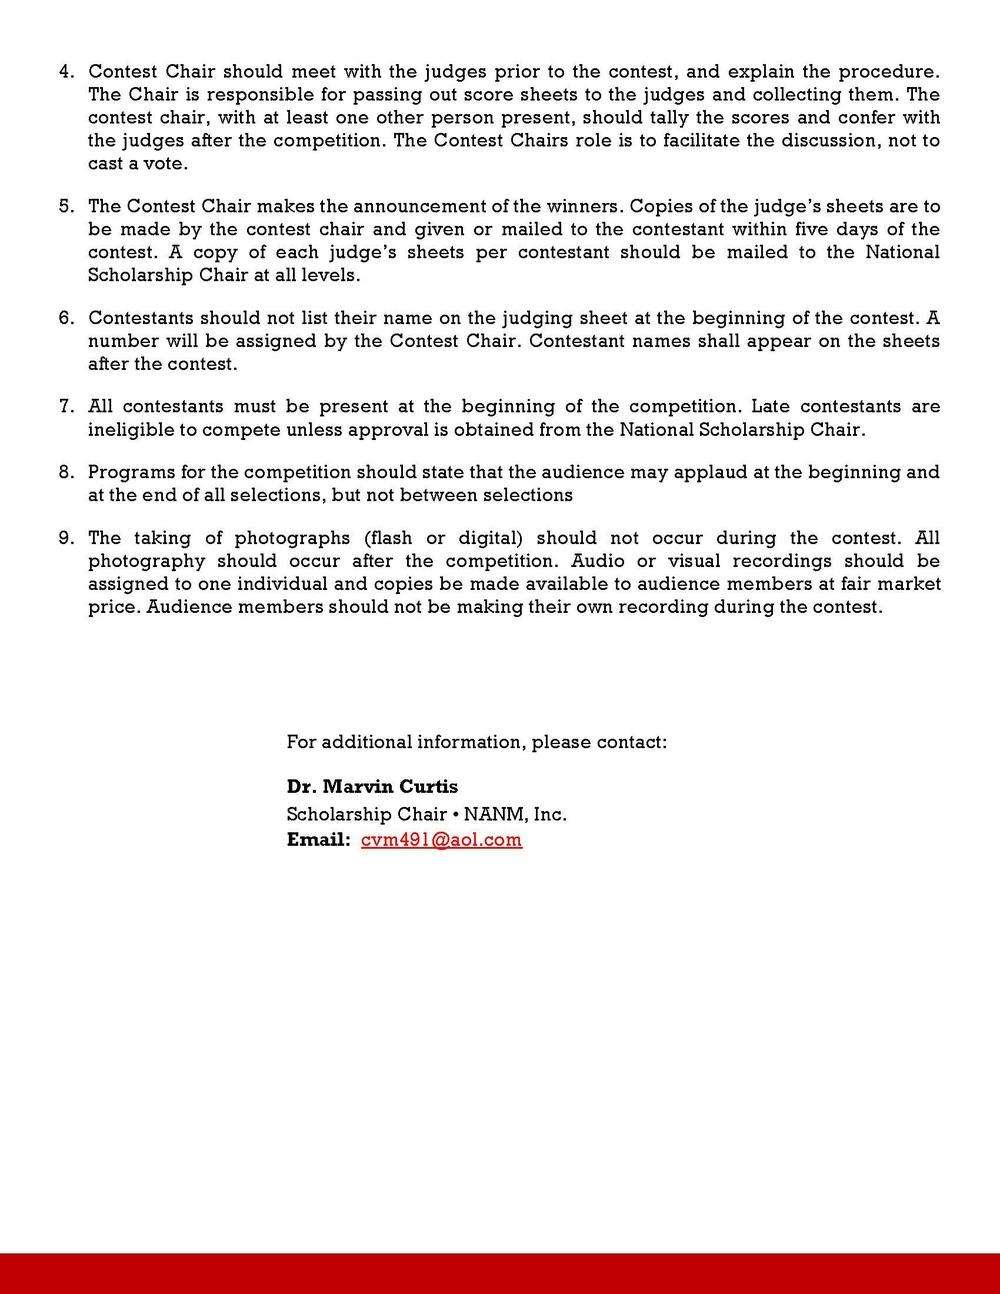 2016-nanm-scholarship-rules_Page_2.jpg